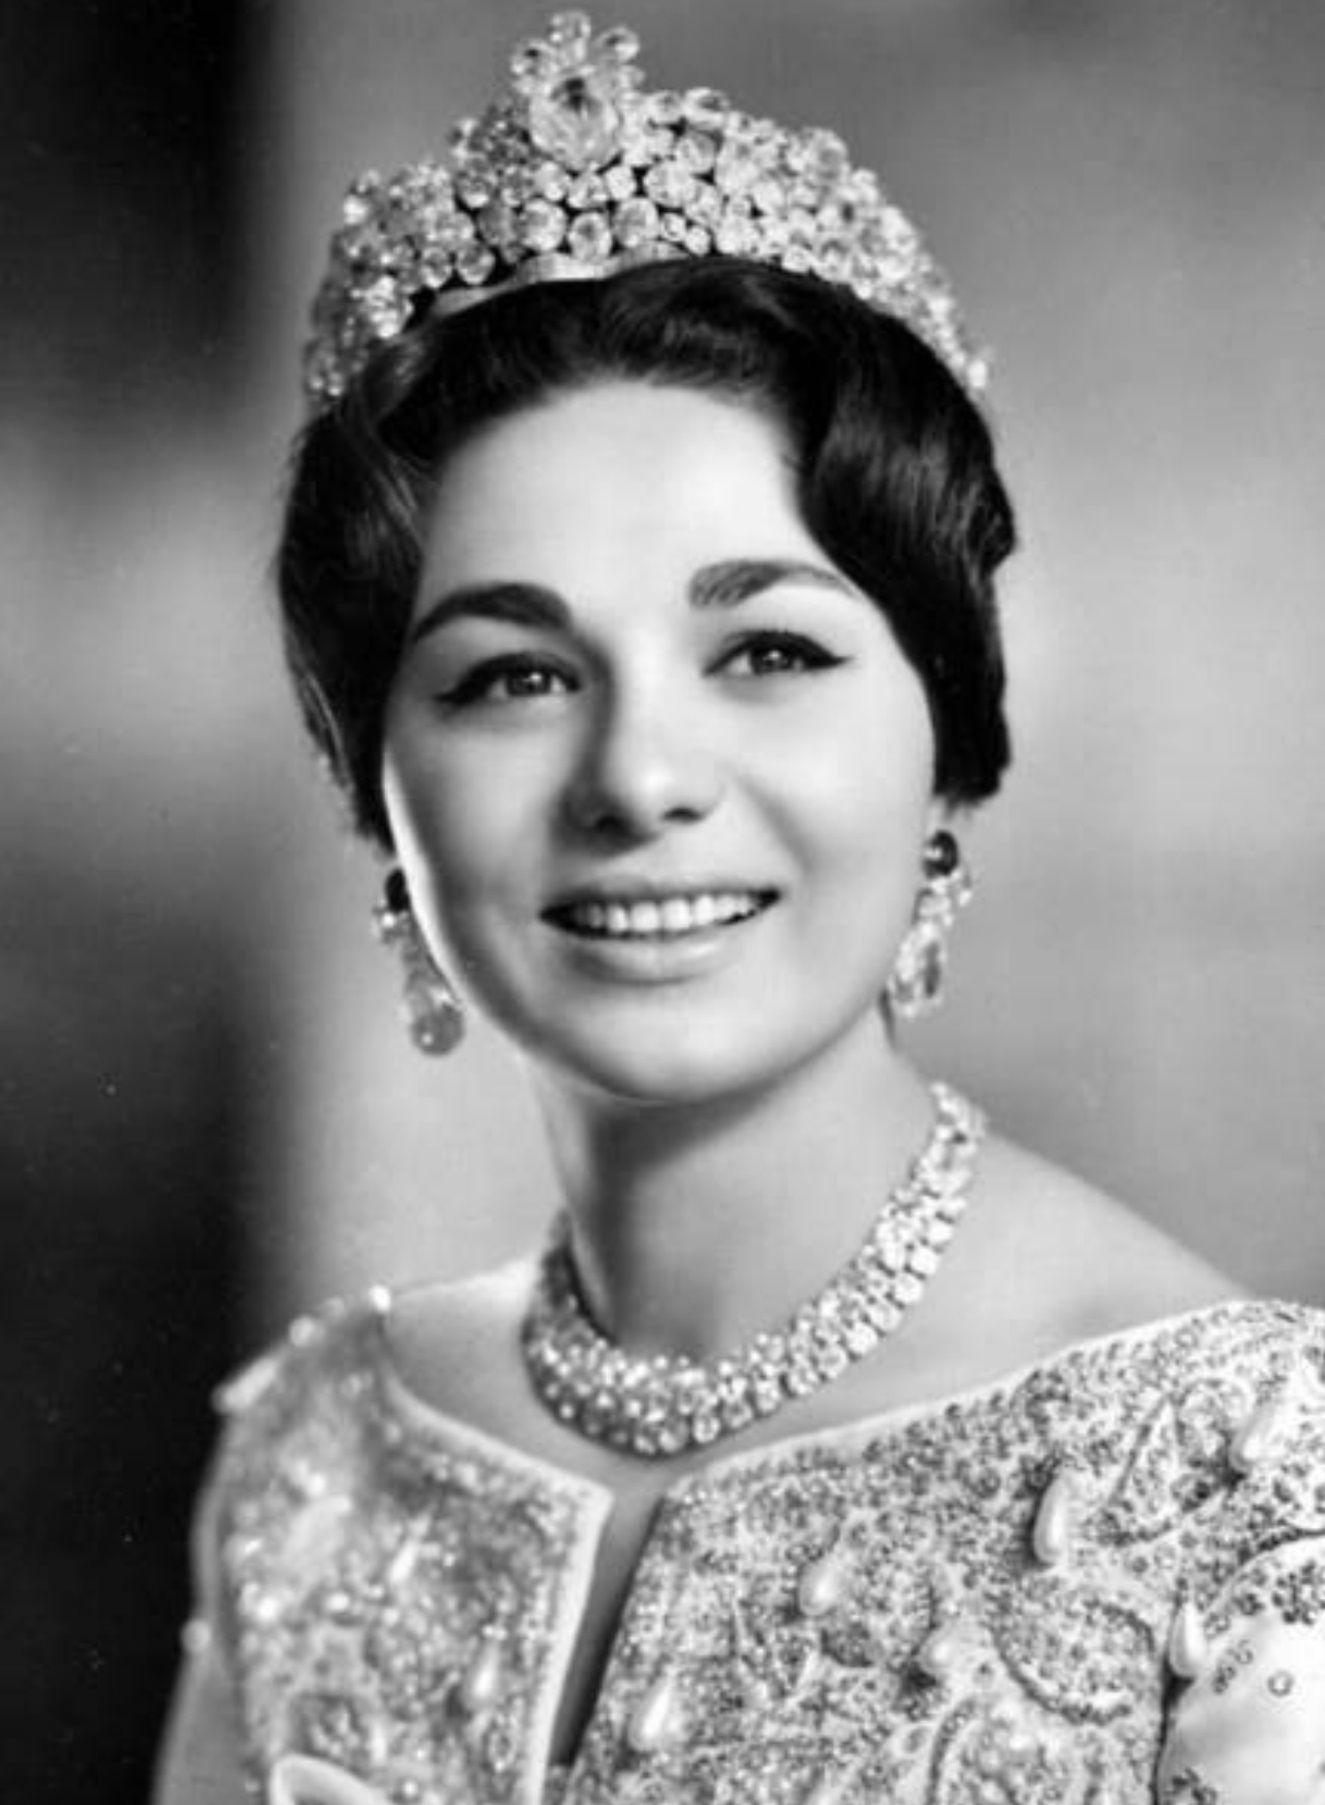 H i m empress farah pahlavi of iran n e diba wearing for Shah bano farah pahlavi